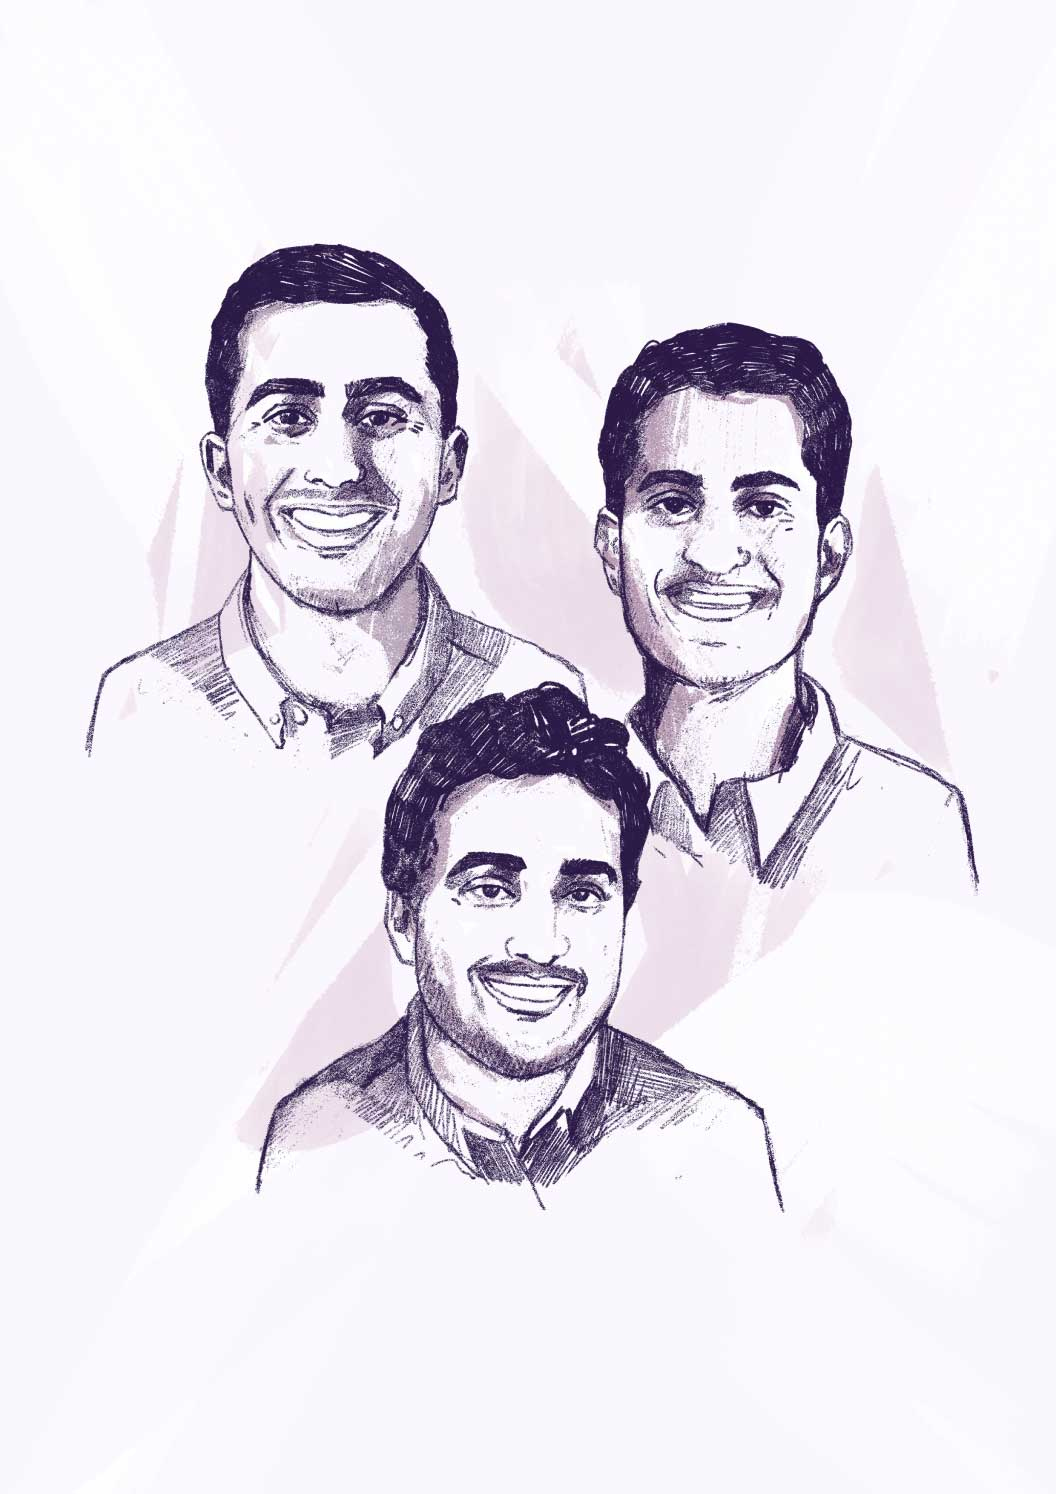 Anish Dhar, Ganesh Datta and Nikhil Unni sketch illustration